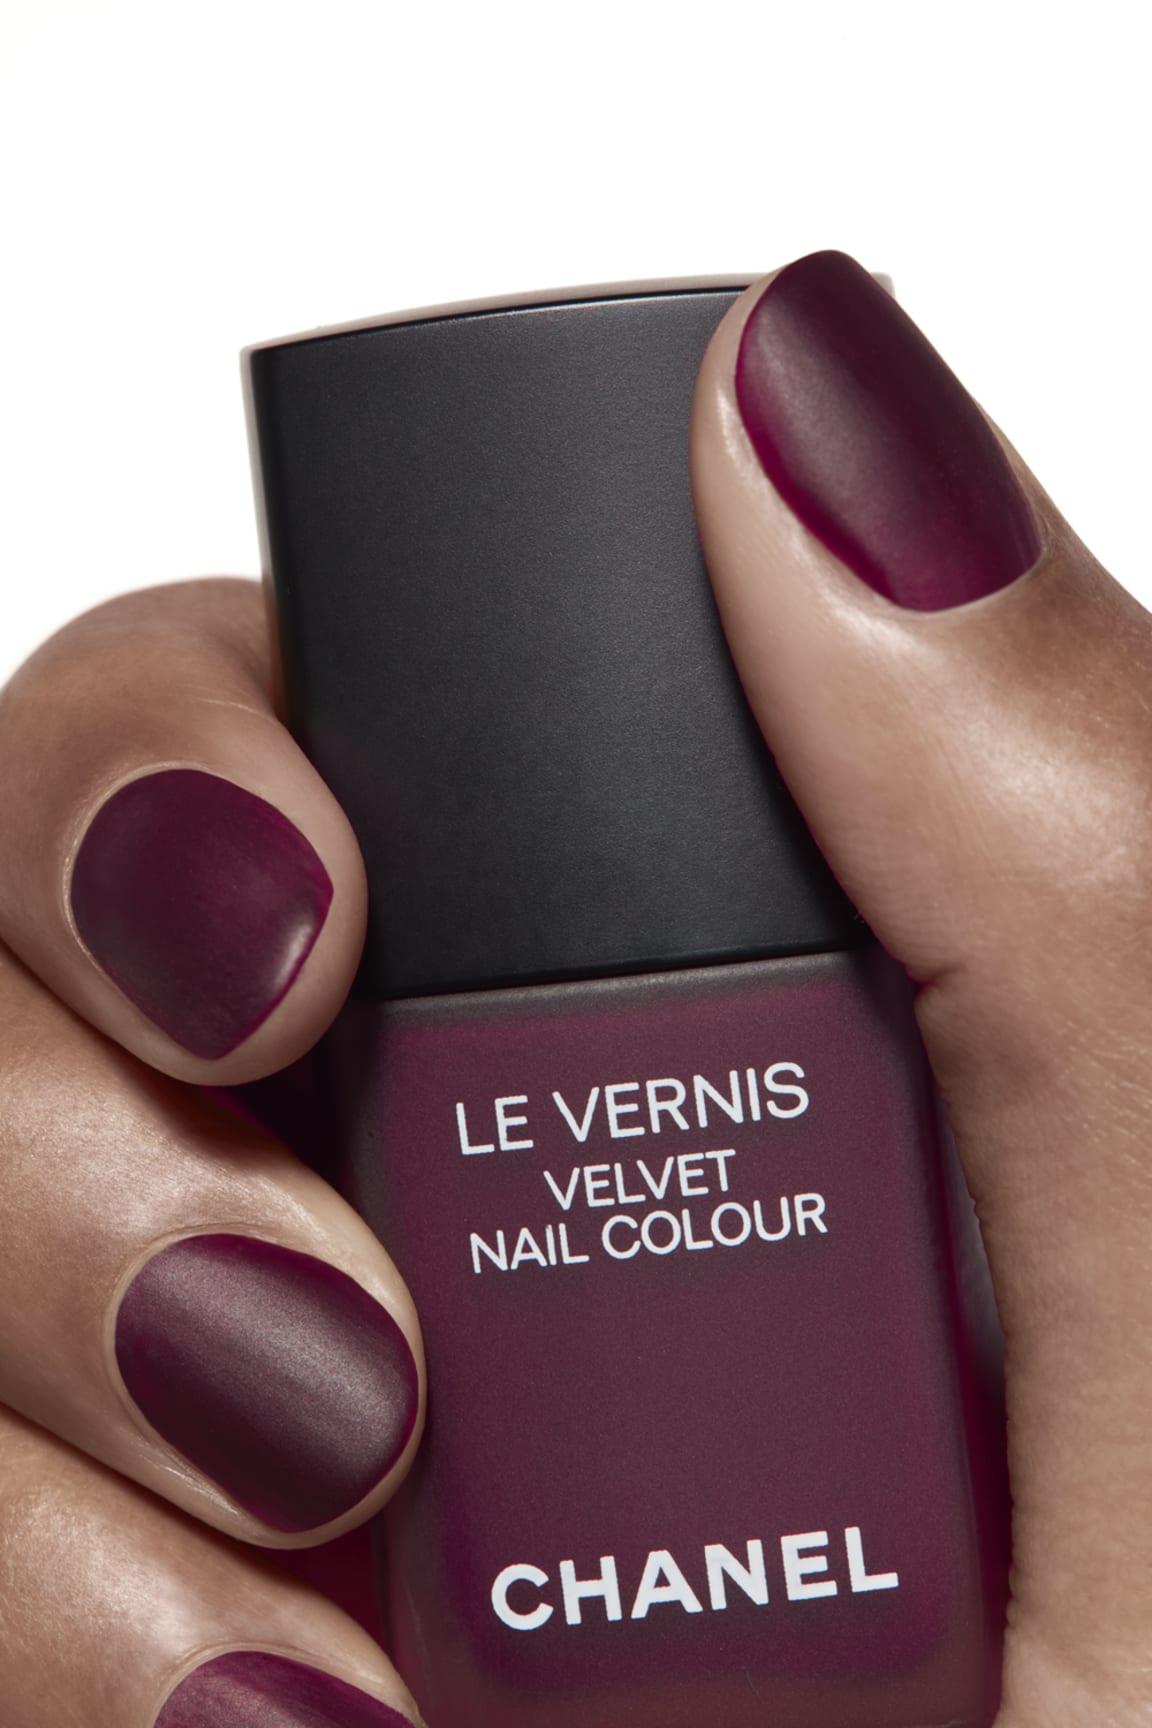 Application makeup visual 1 - LE VERNIS 638 - PROFONDEUR